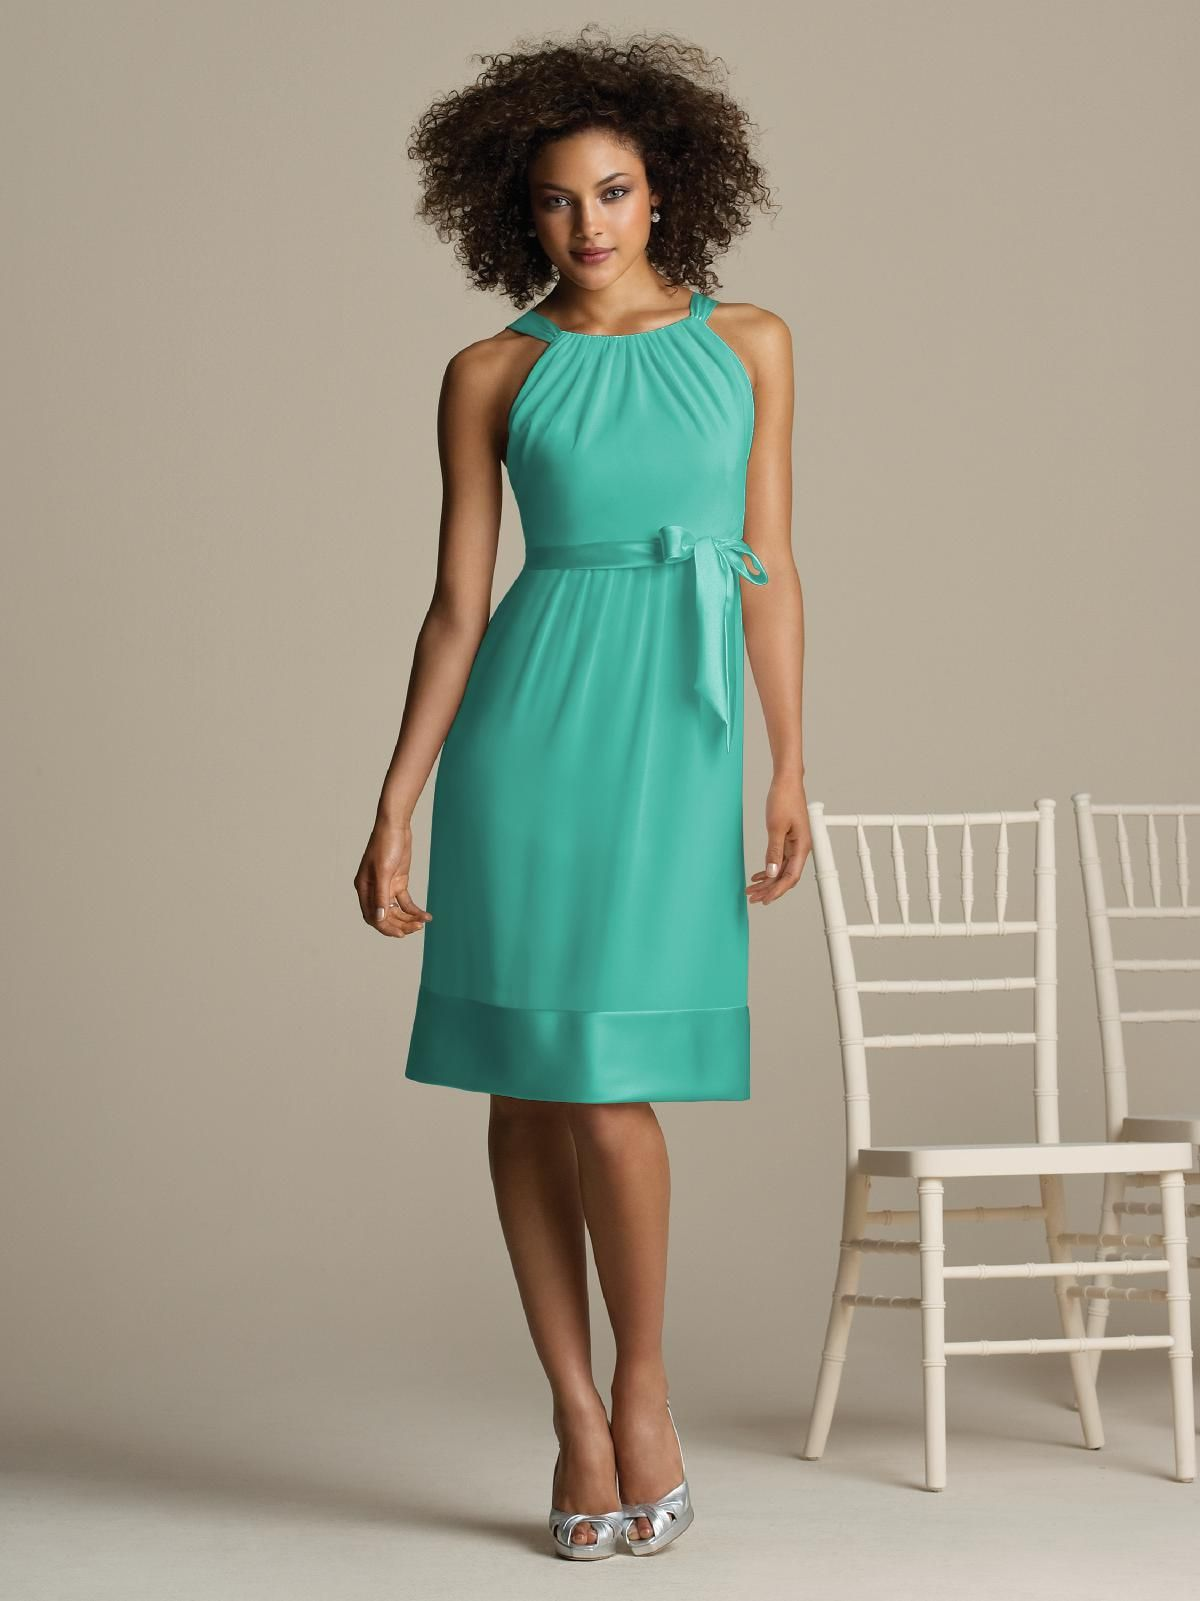 Dessy - after six - pantone turquoise | bridesmaid dresses ...